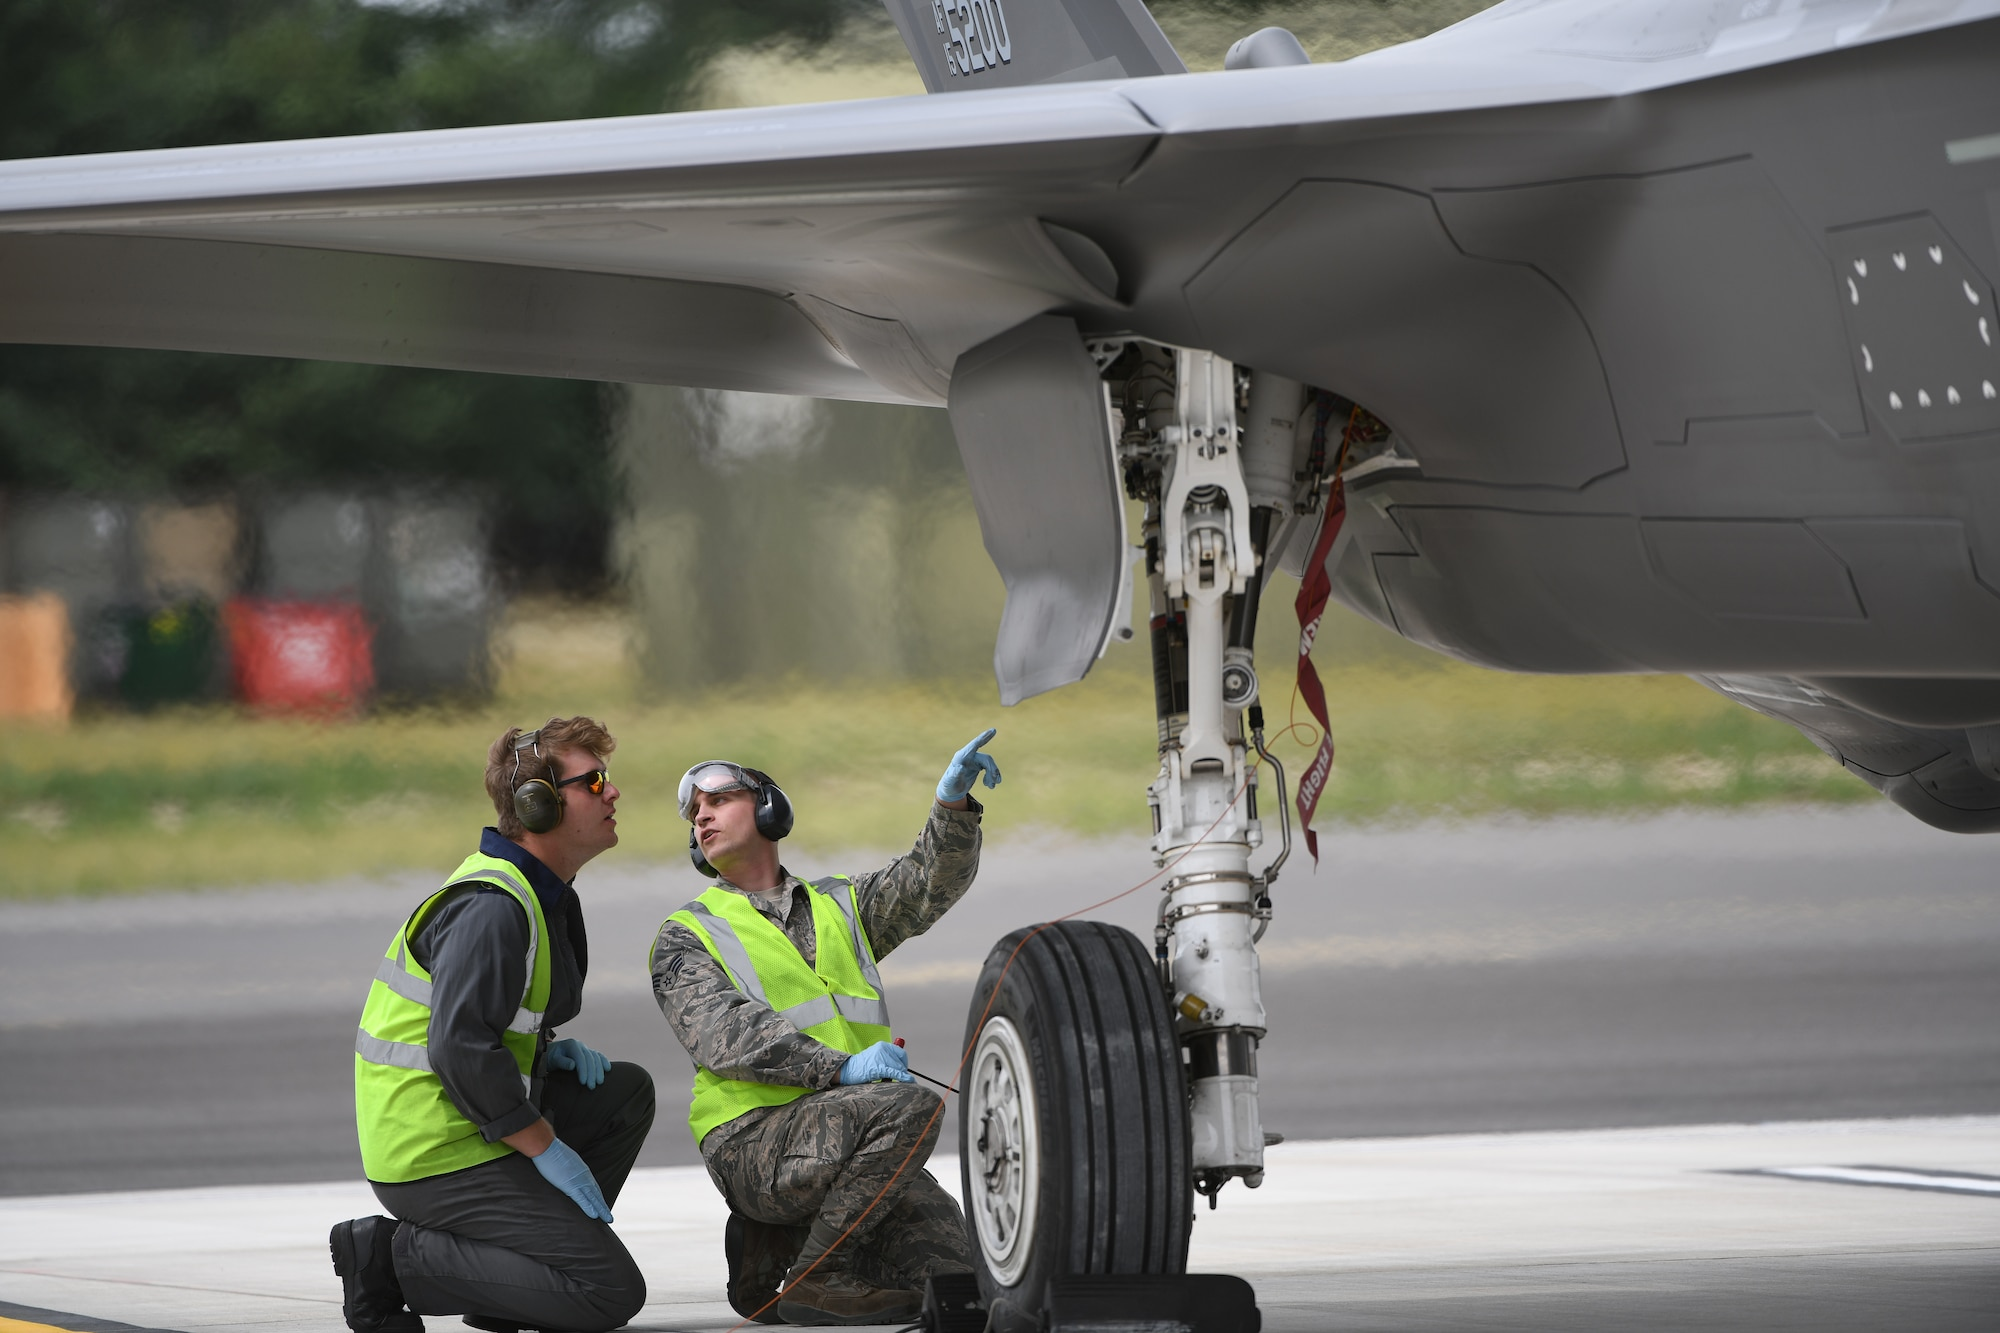 F-35A Lightning II aircraft conduct hot pit refueling at RAF Marham, England.